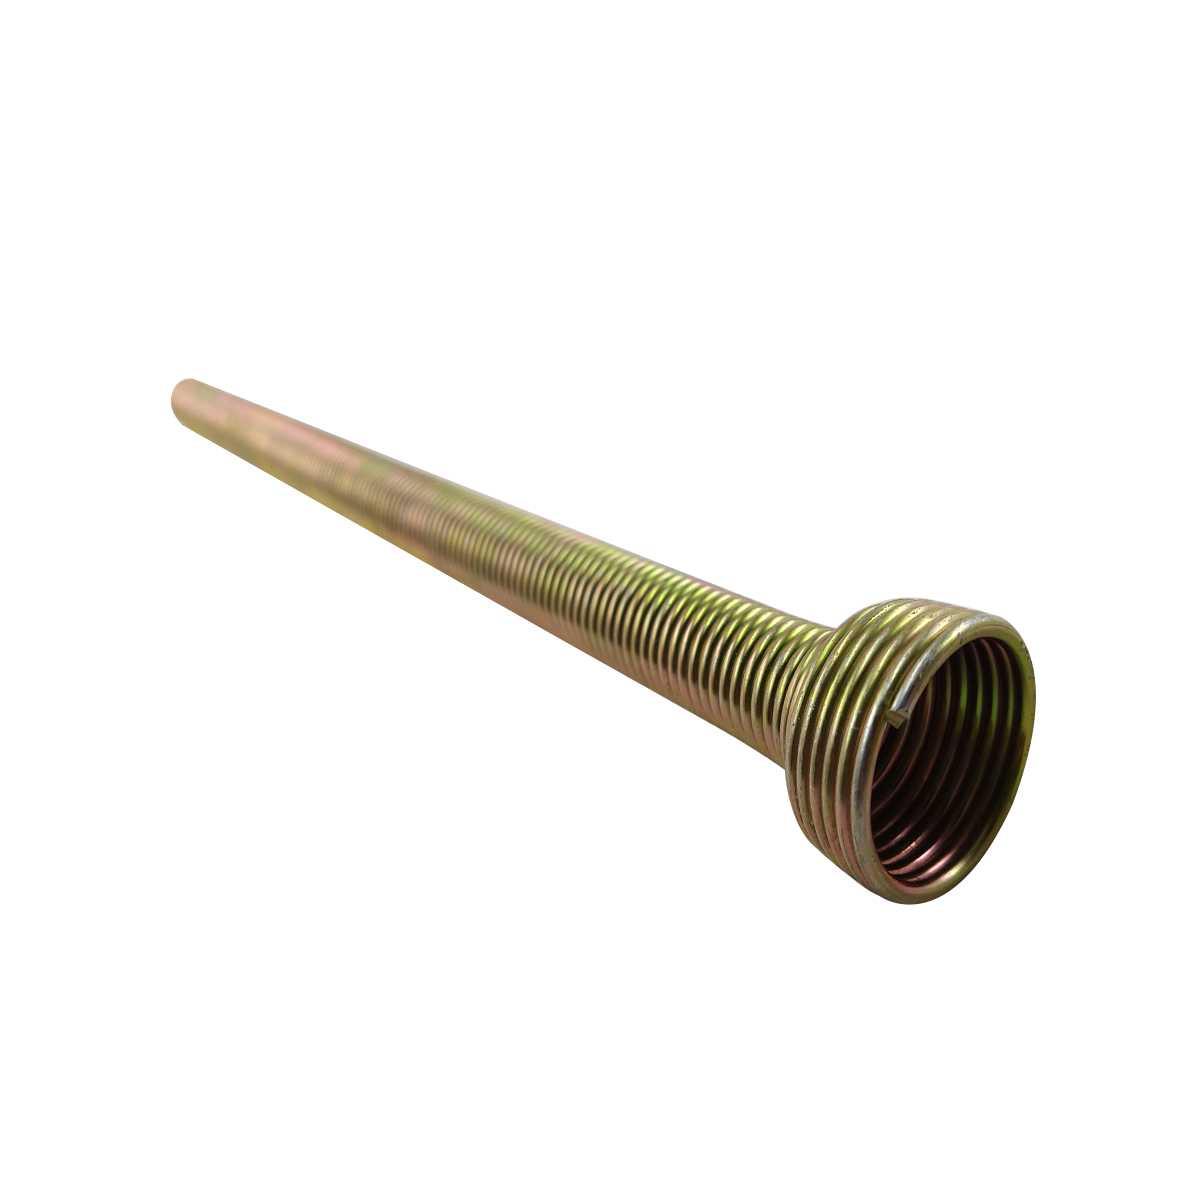 Mola curvador para tubo de cobre 3/8